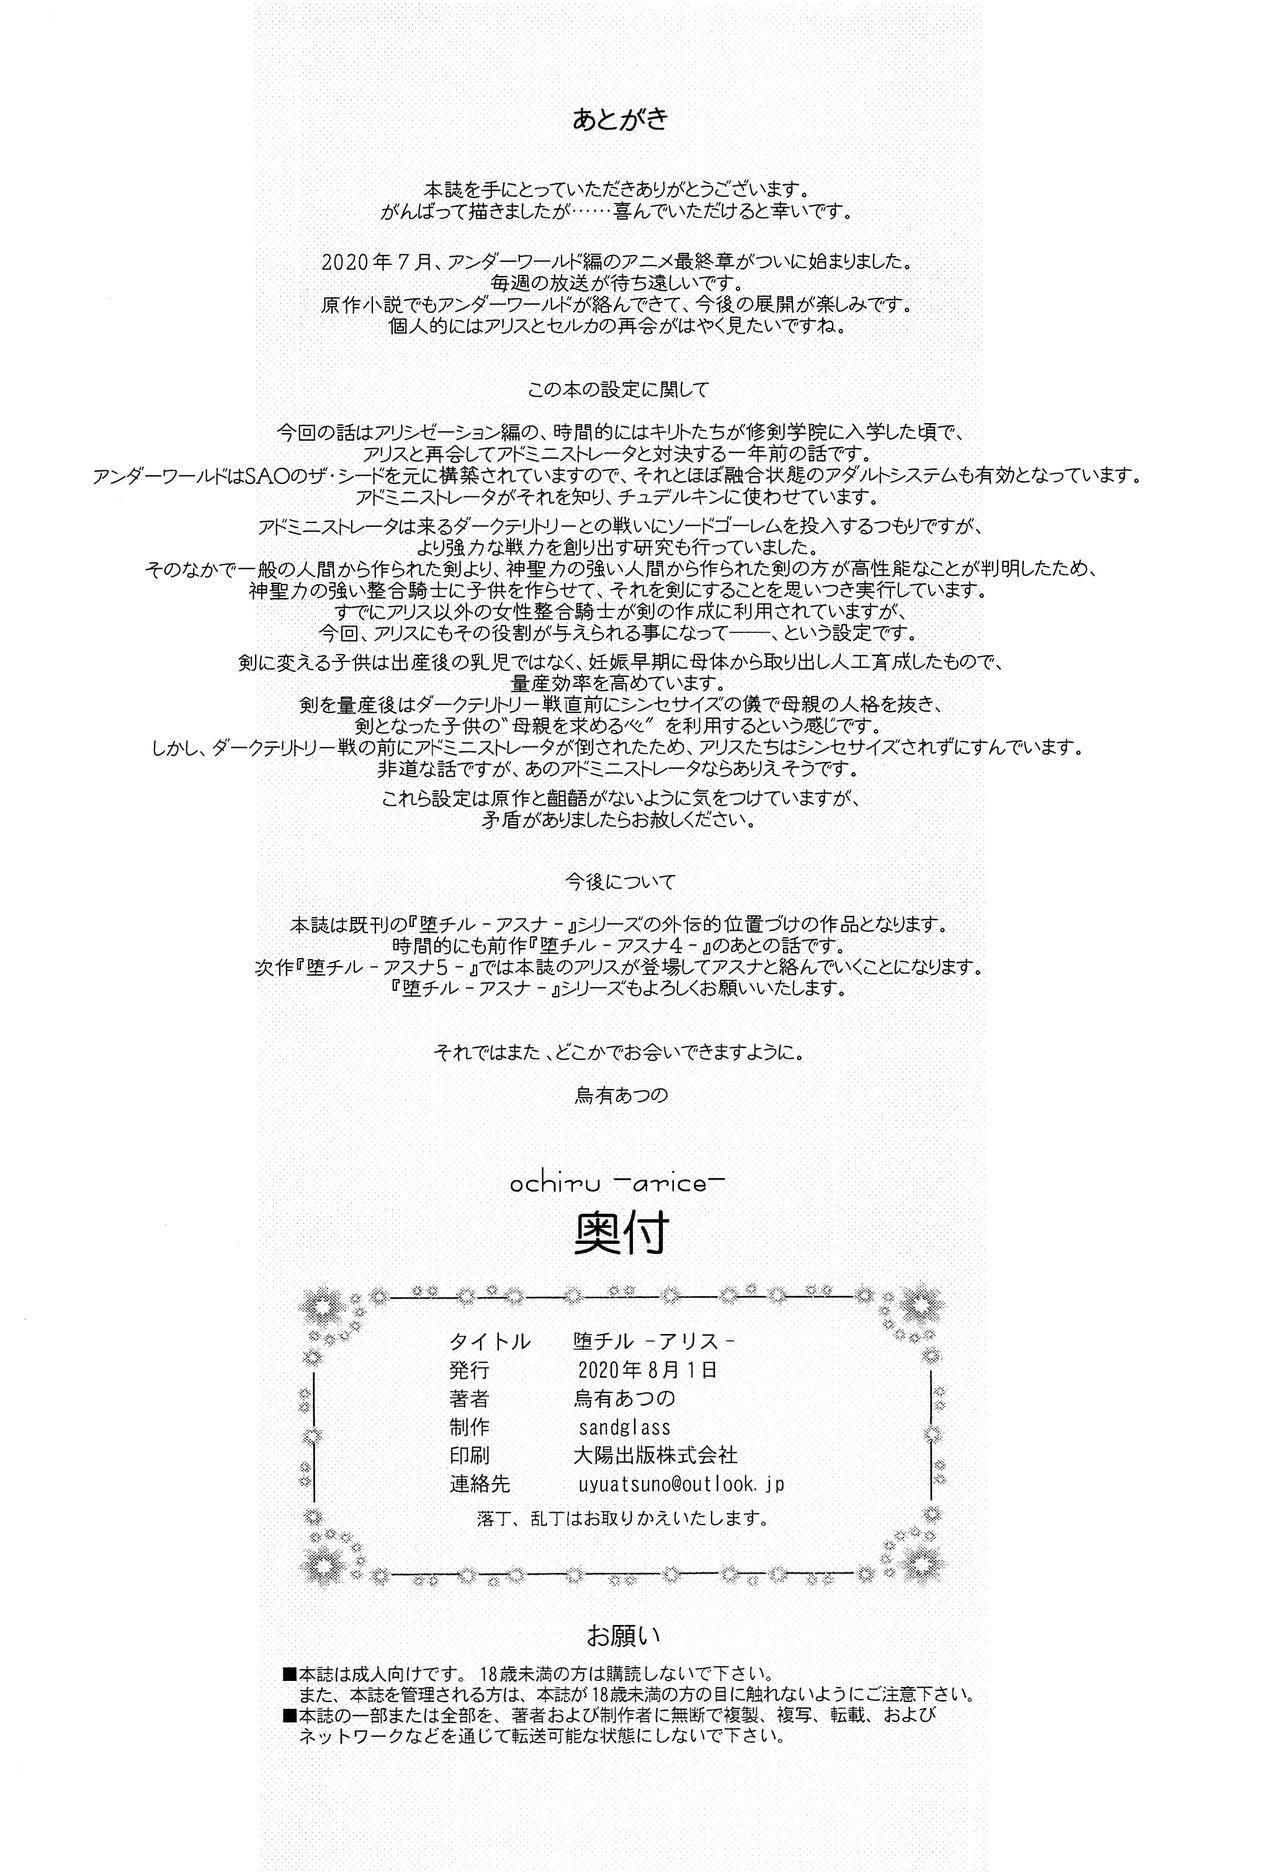 Ochiru 44